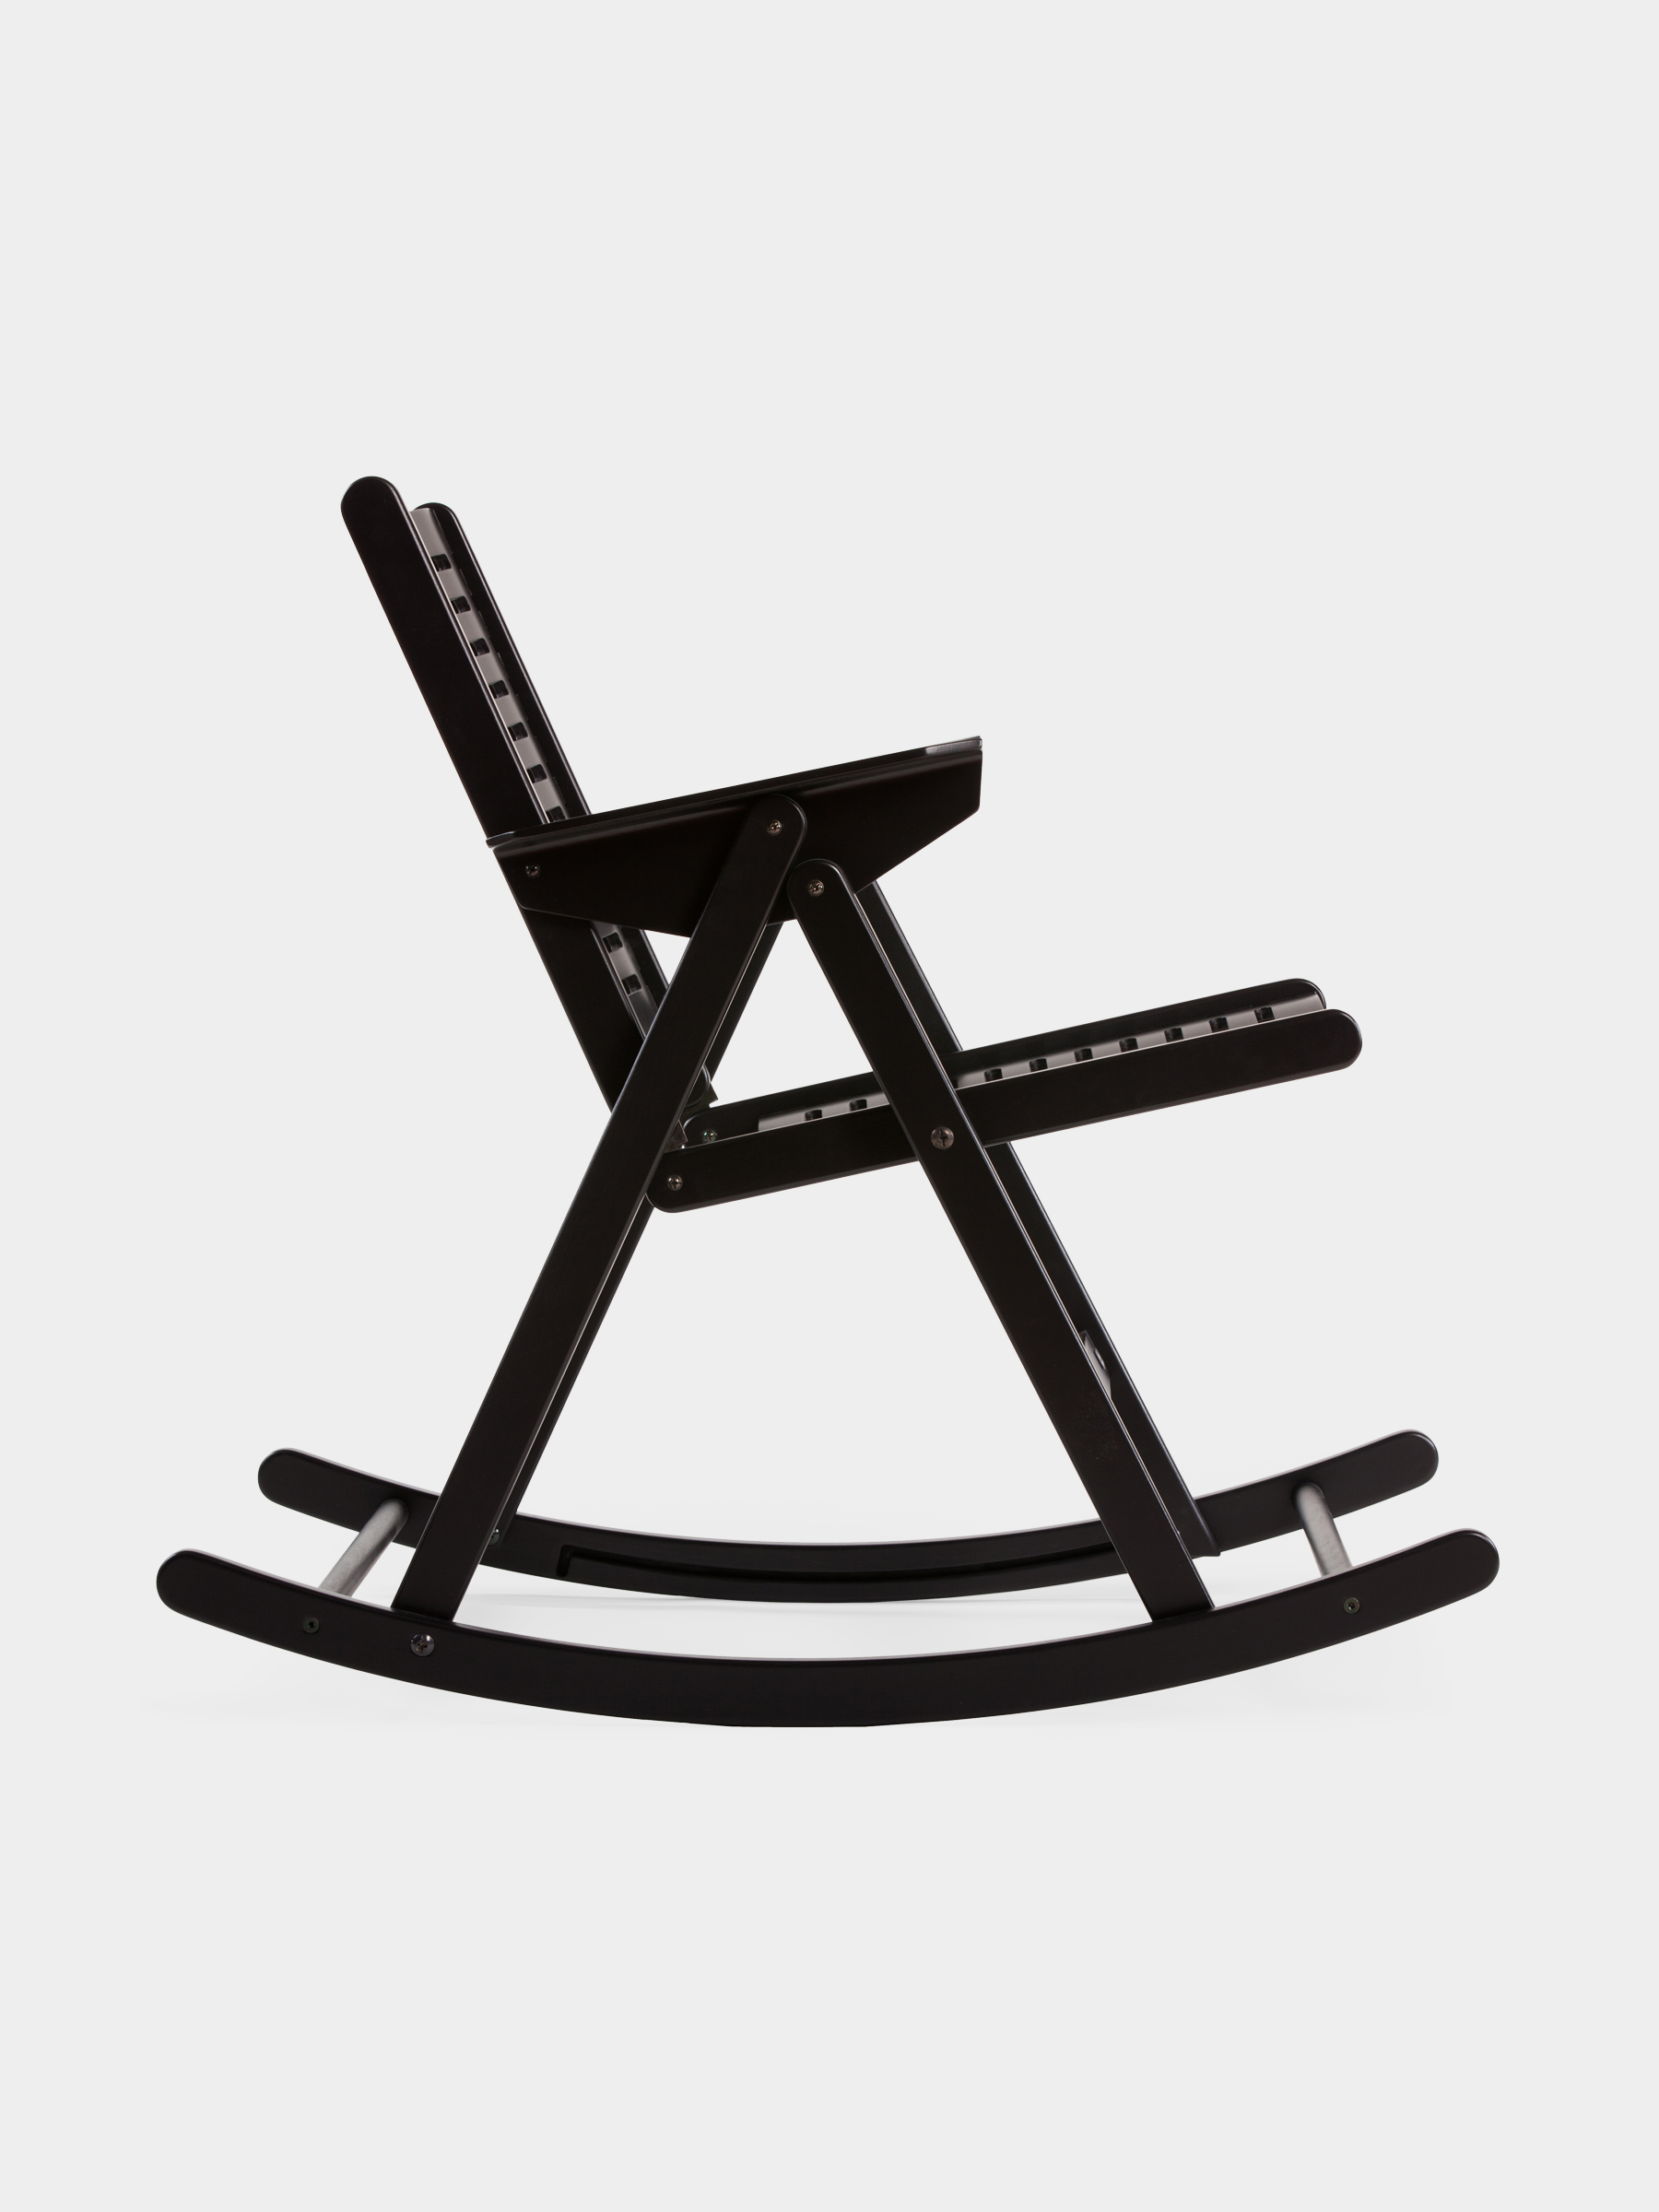 Rex_Kralj_Rocking_Chair black